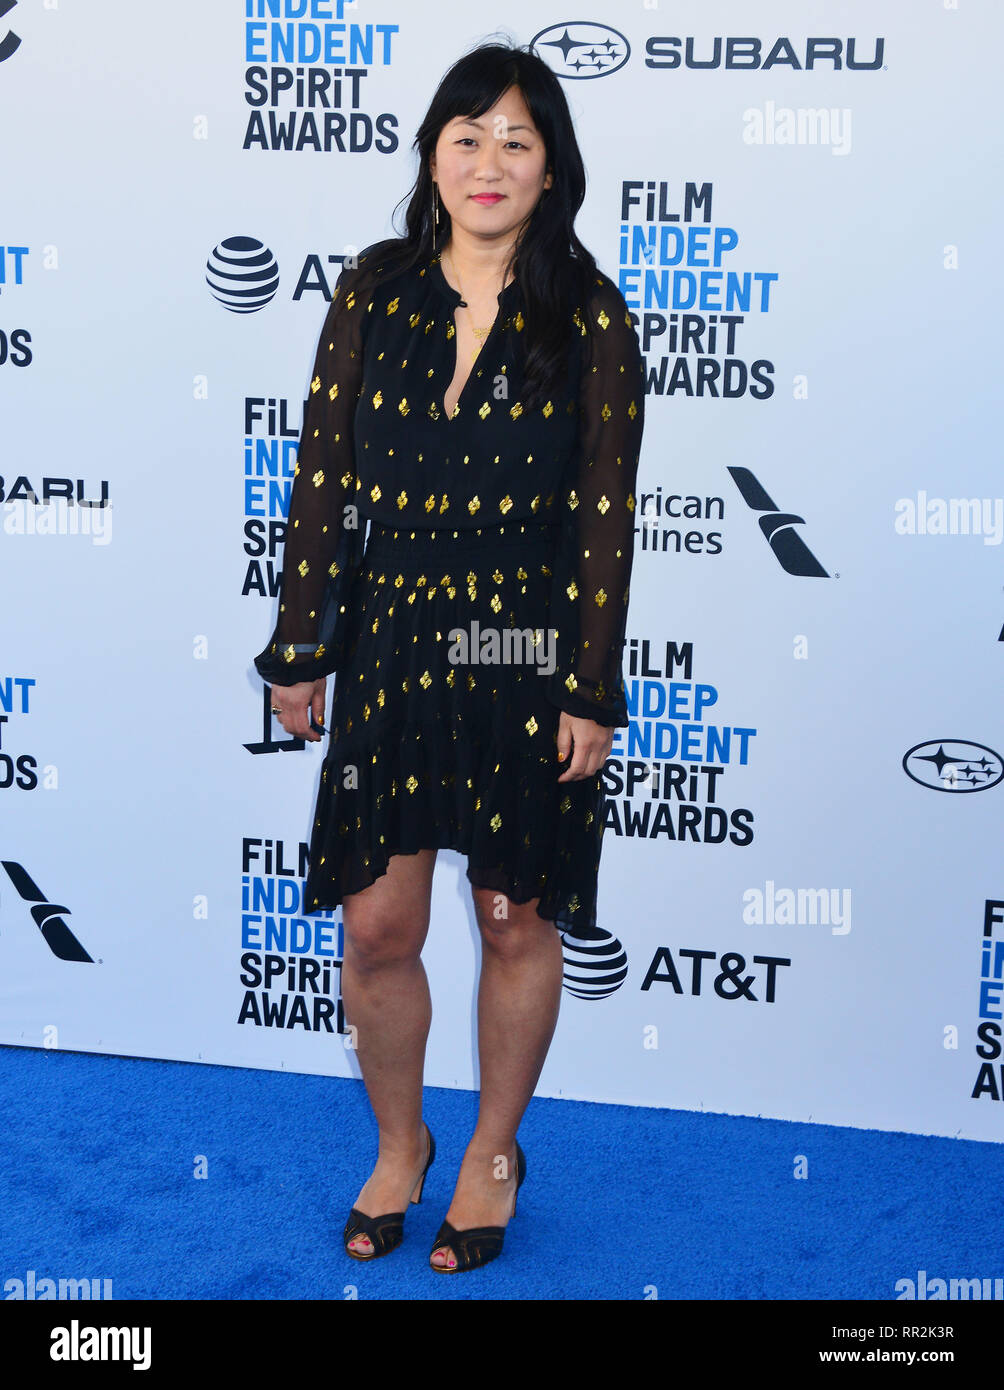 Santa Monica, Californie, USA. Feb 23, 2019. Christina Choe 156 assiste à la Film Independent Spirit Awards 2019 le 23 février 2019 à Santa Monica, en Californie. Credit: Tsuni / USA/Alamy Live News Photo Stock